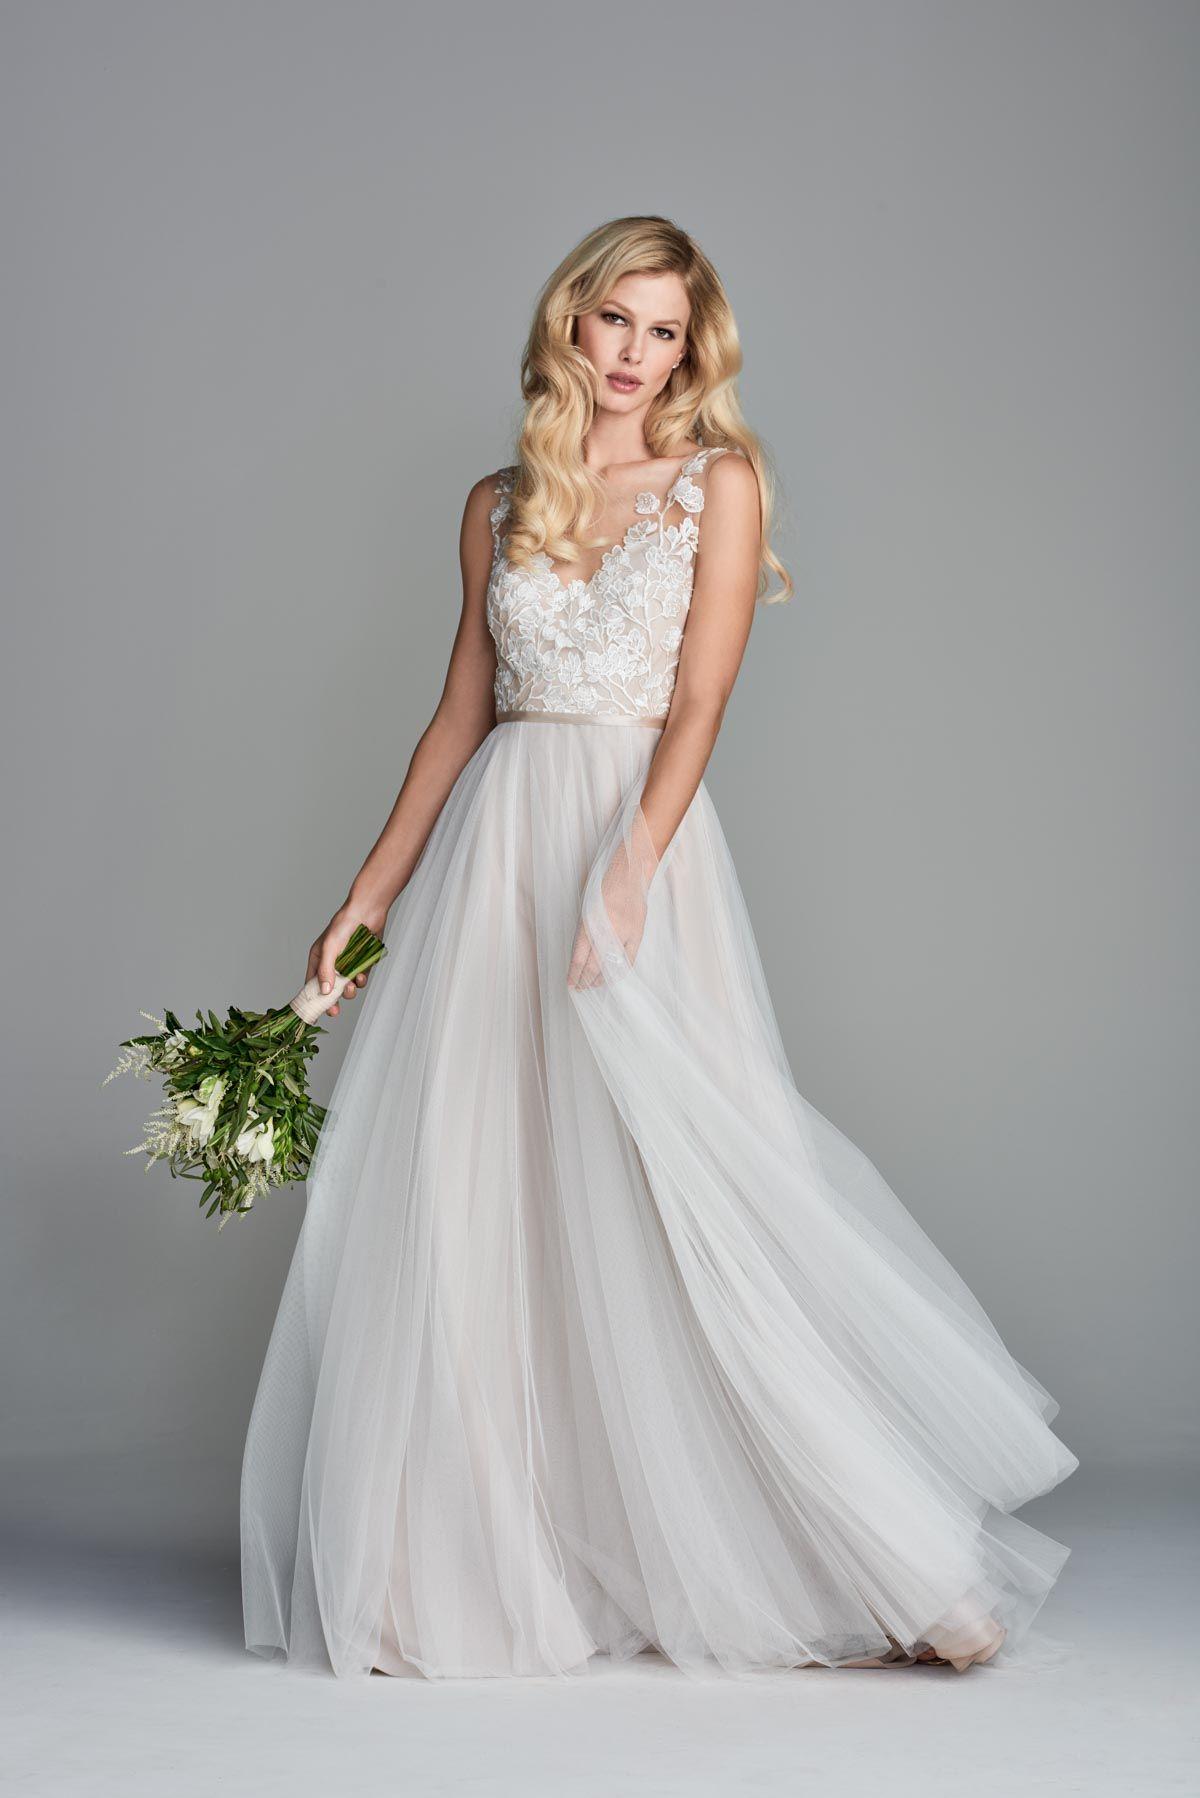 Lace dress vintage april 2019 Juno   Wtoo Brides  Wtoo Vows Alexandraus fall river